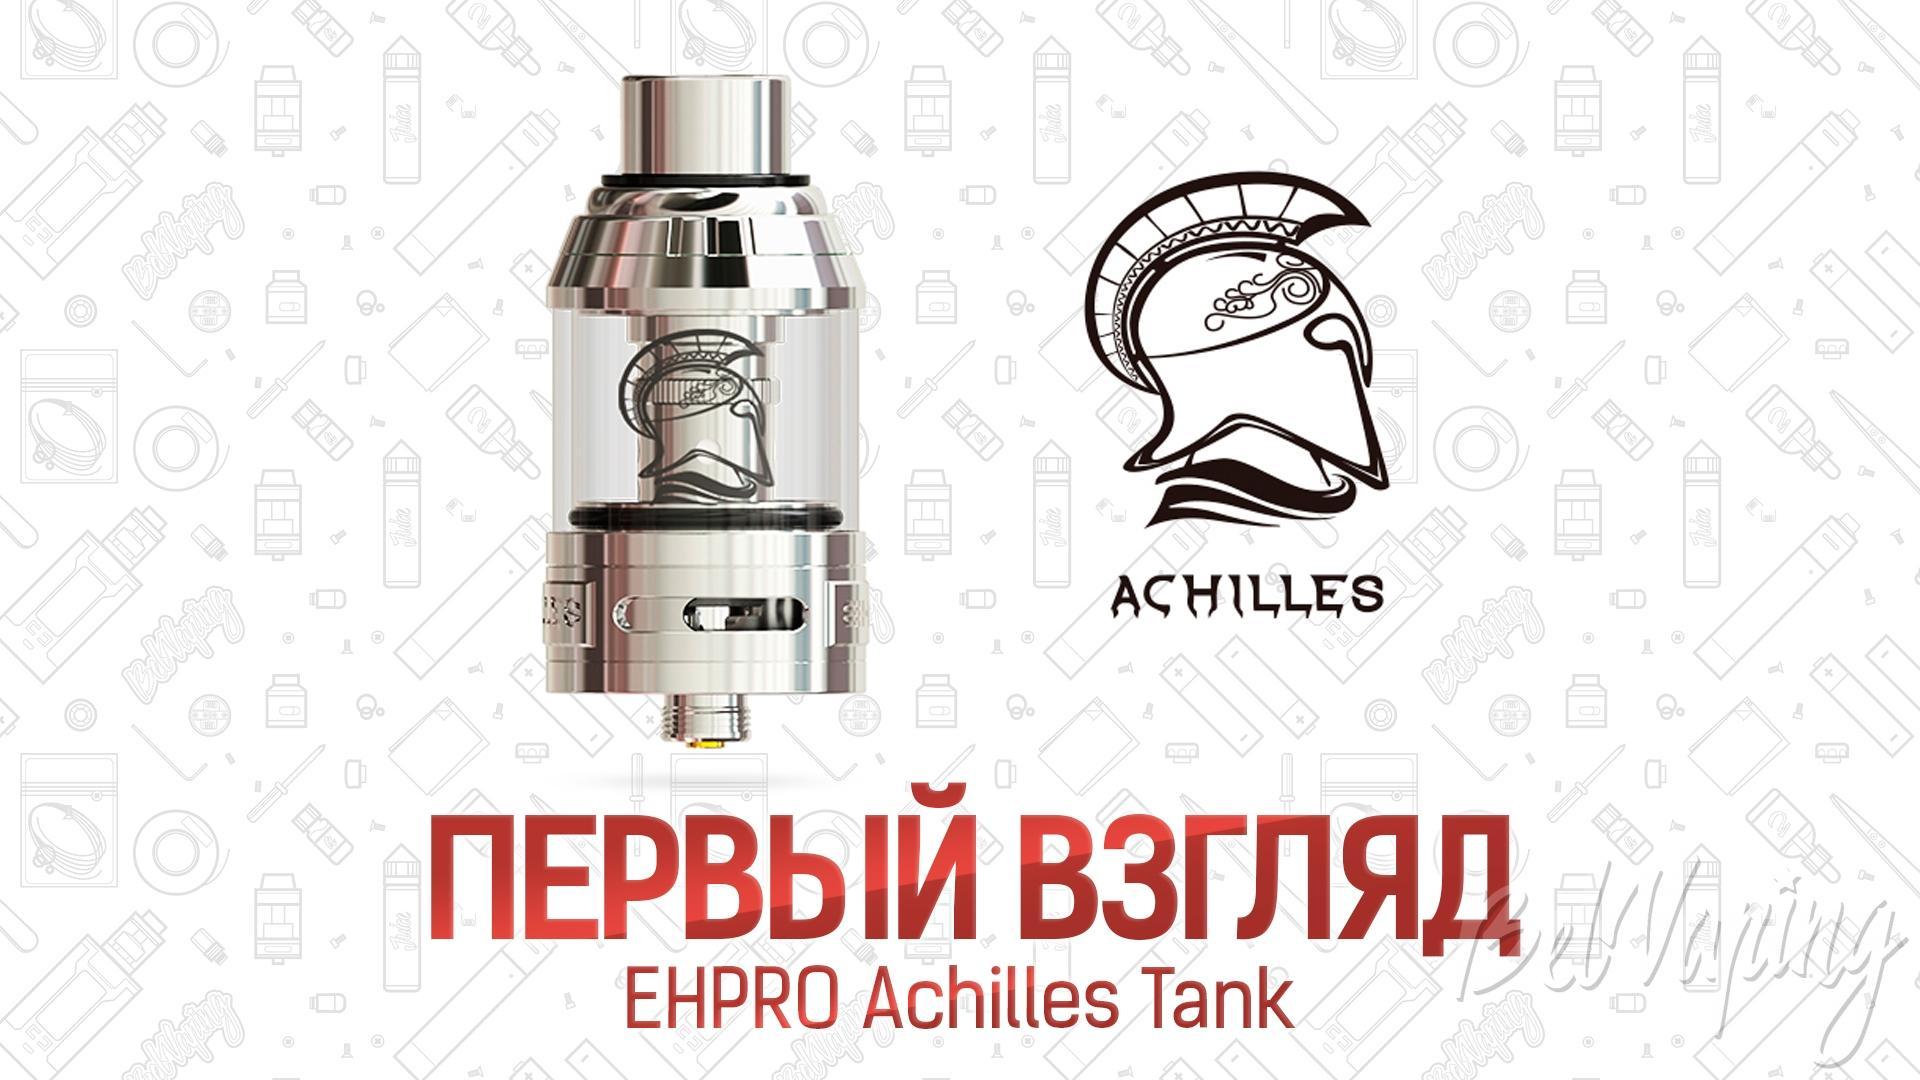 EHPRO Achilles Tank. Первый взгляд